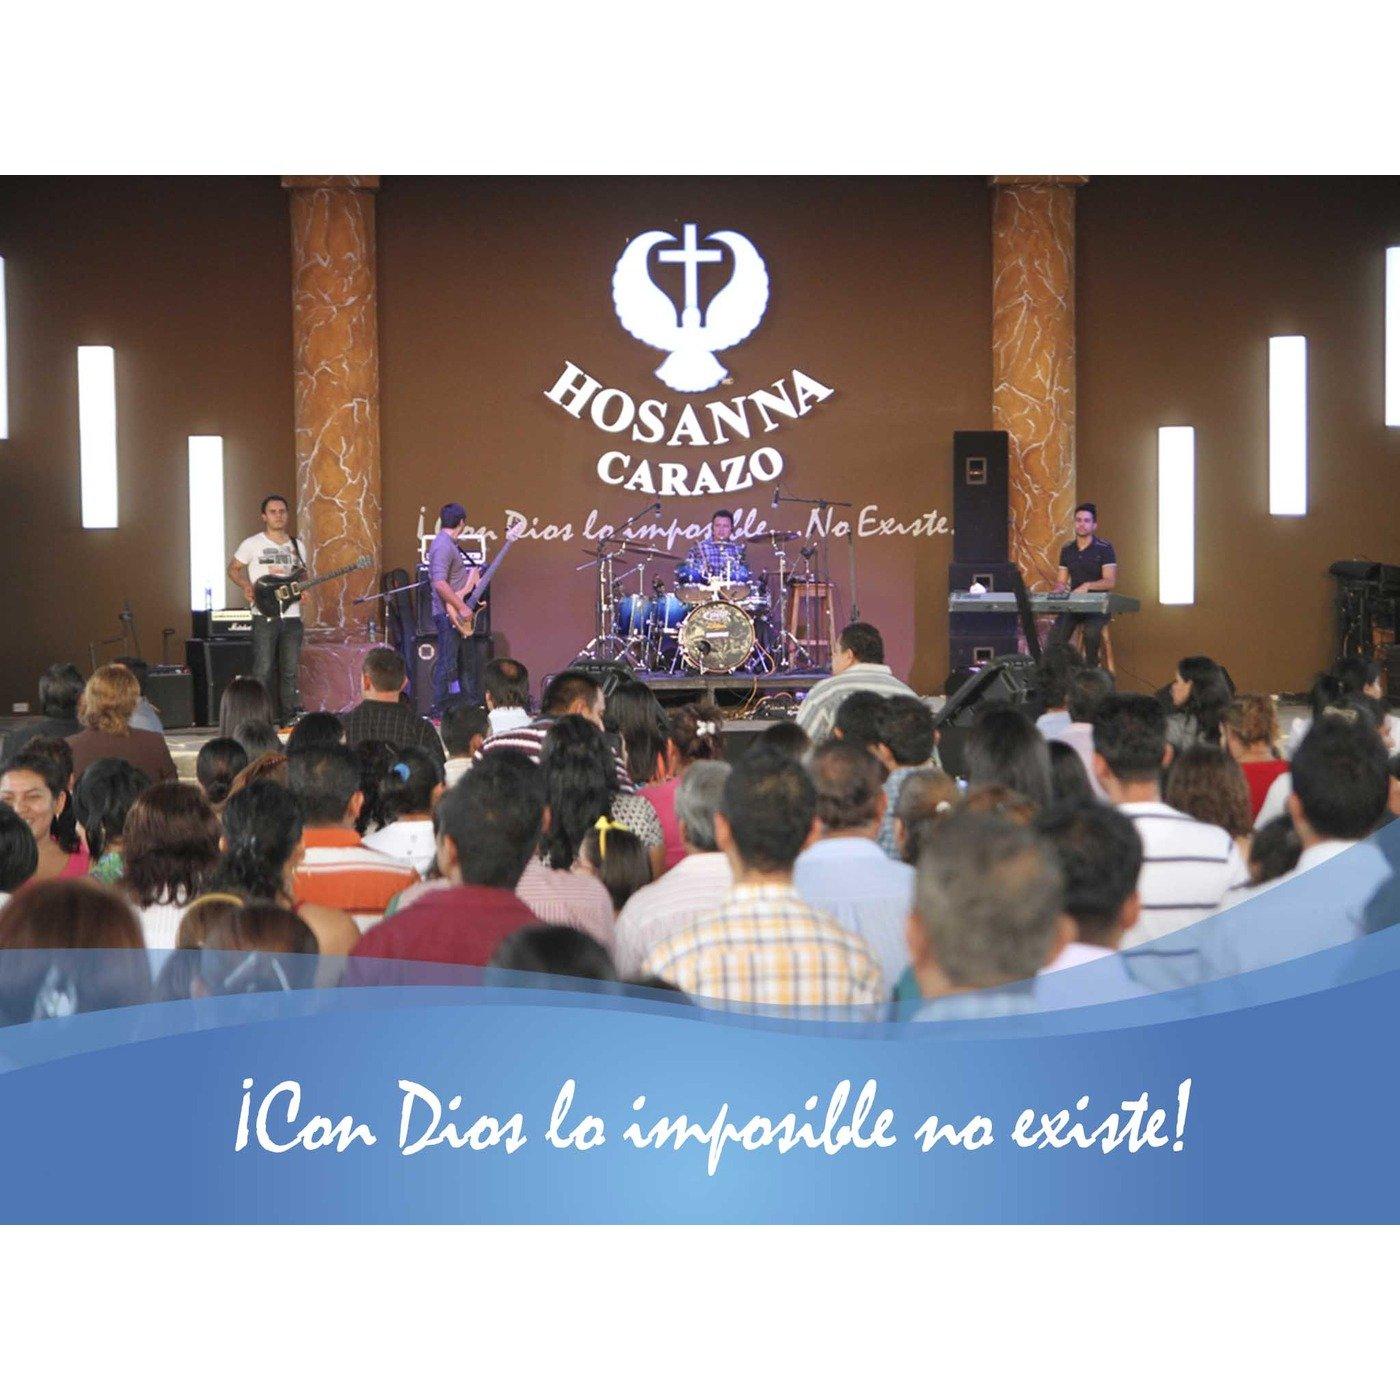 <![CDATA[Iglesia Hosanna Carazo]]>